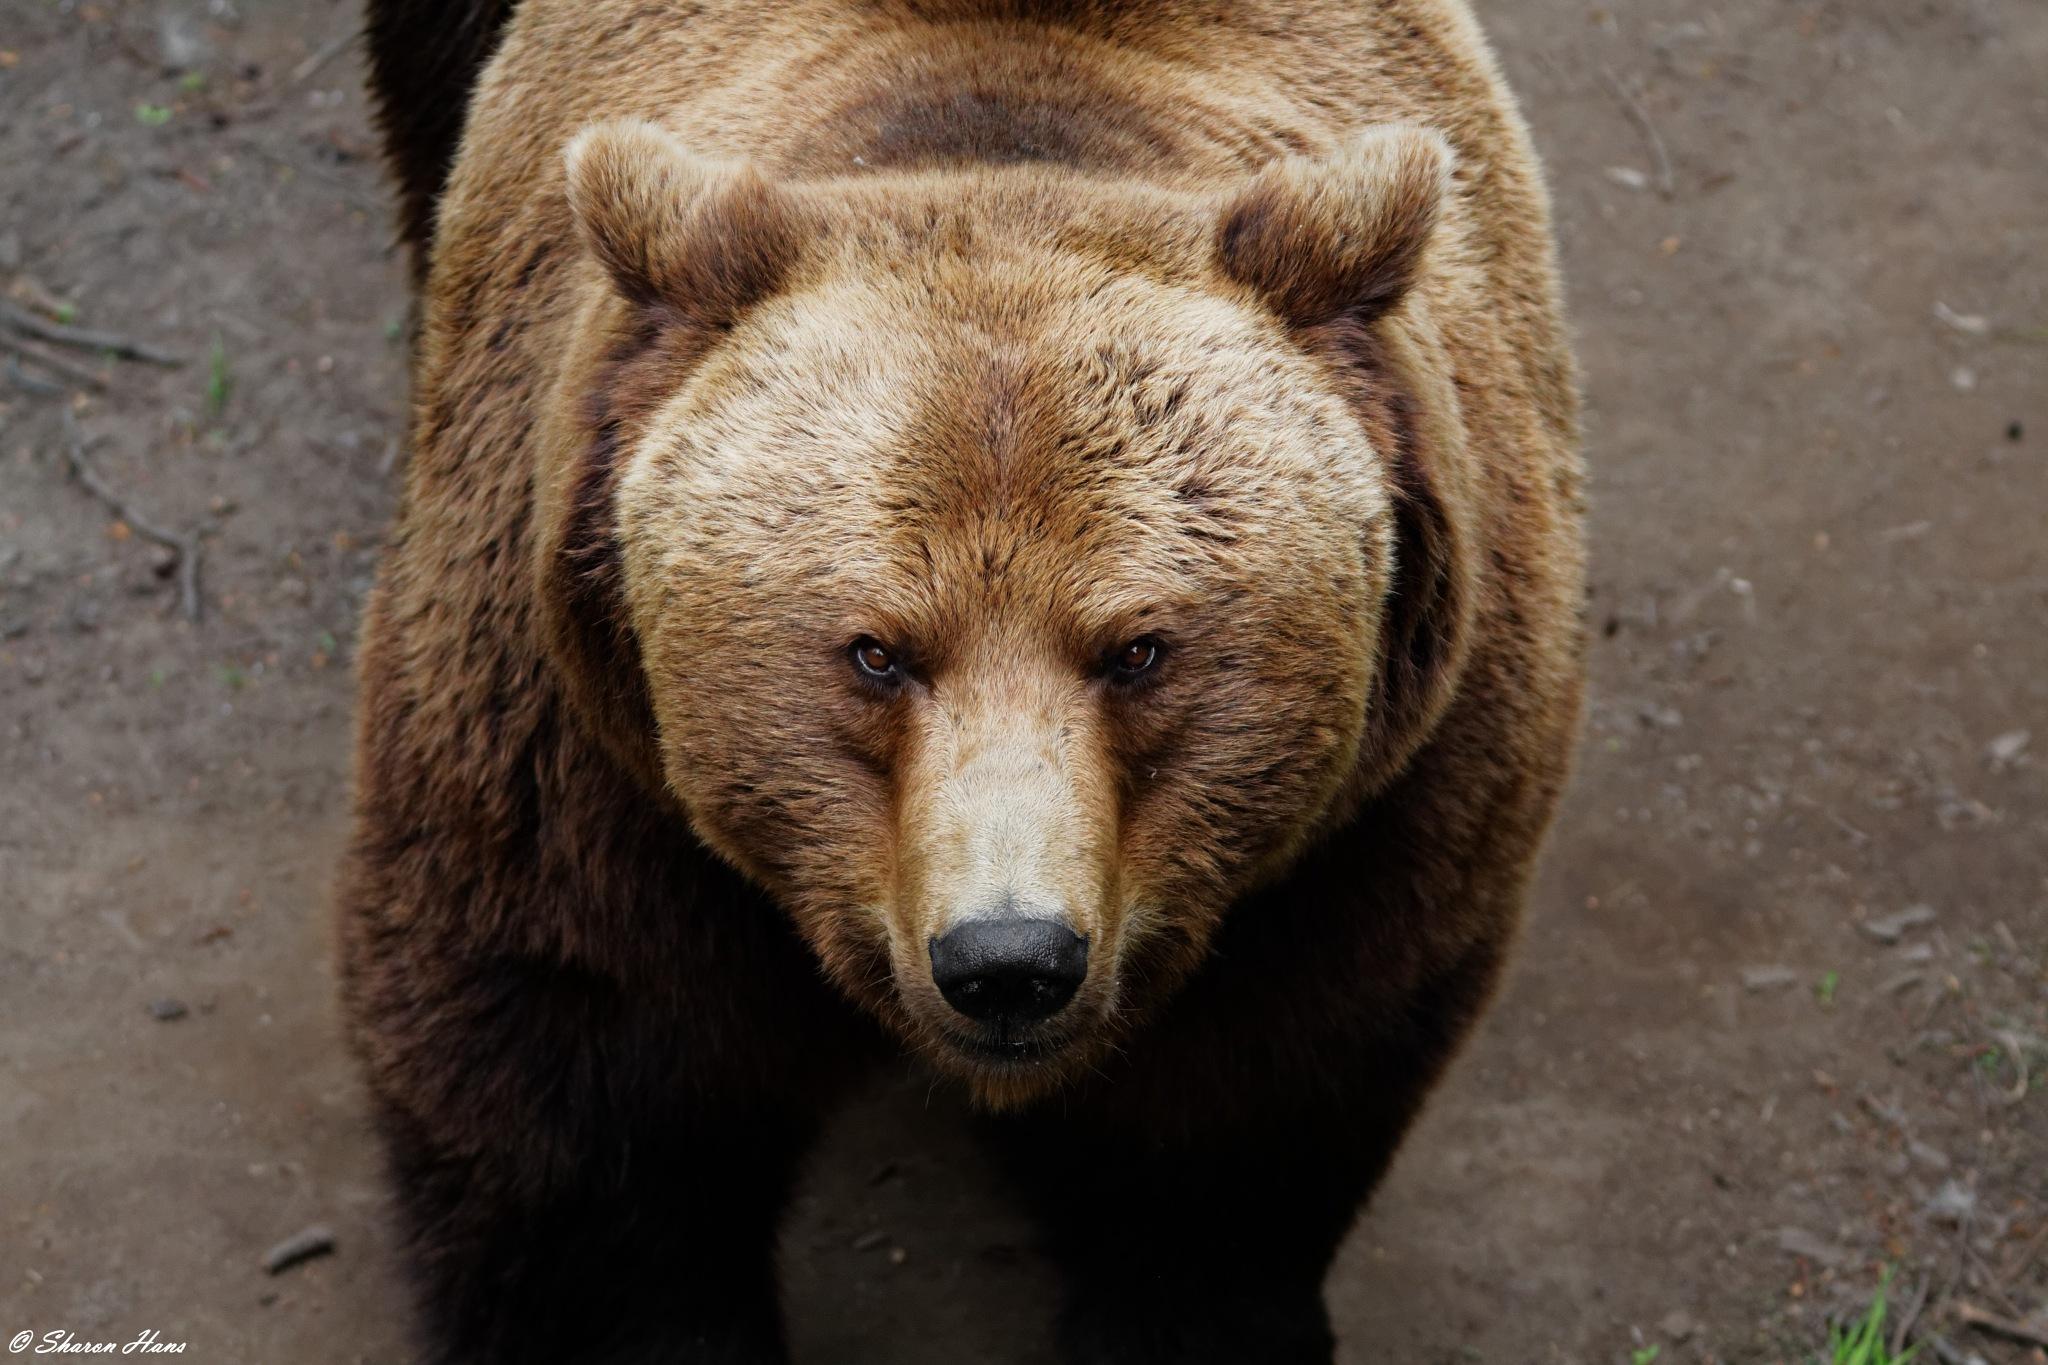 Brown Bear by Sharon Hans